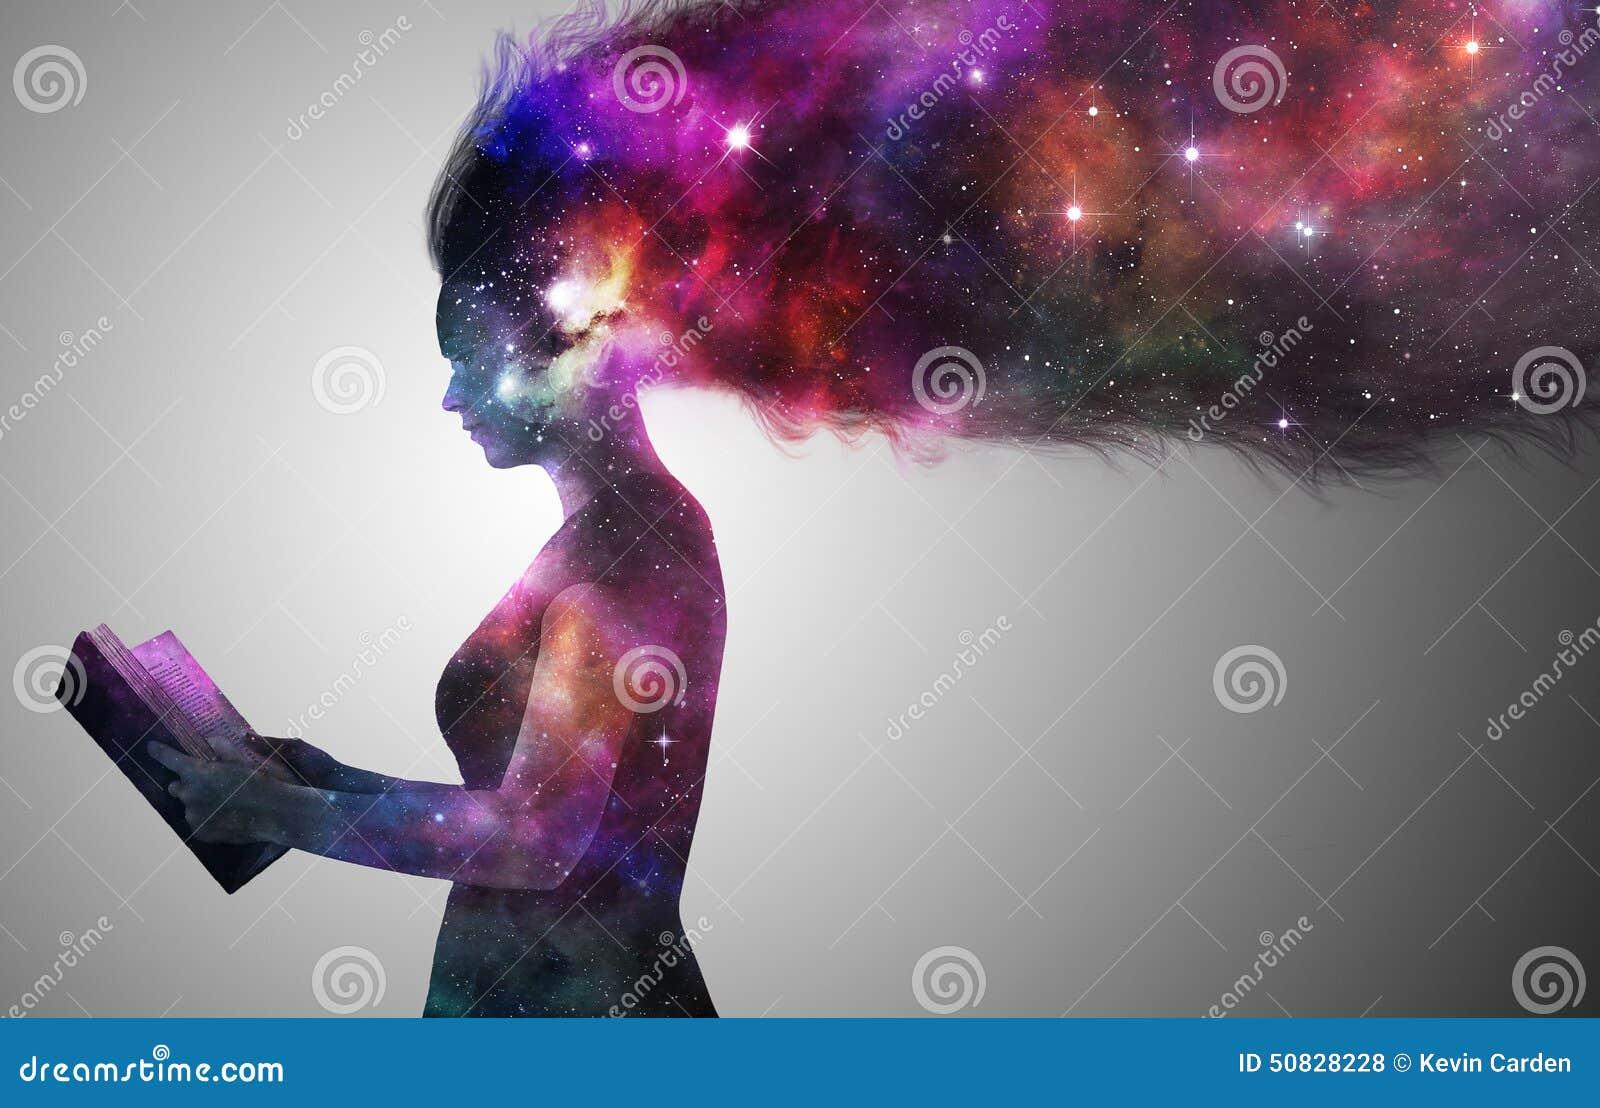 Universumfrau